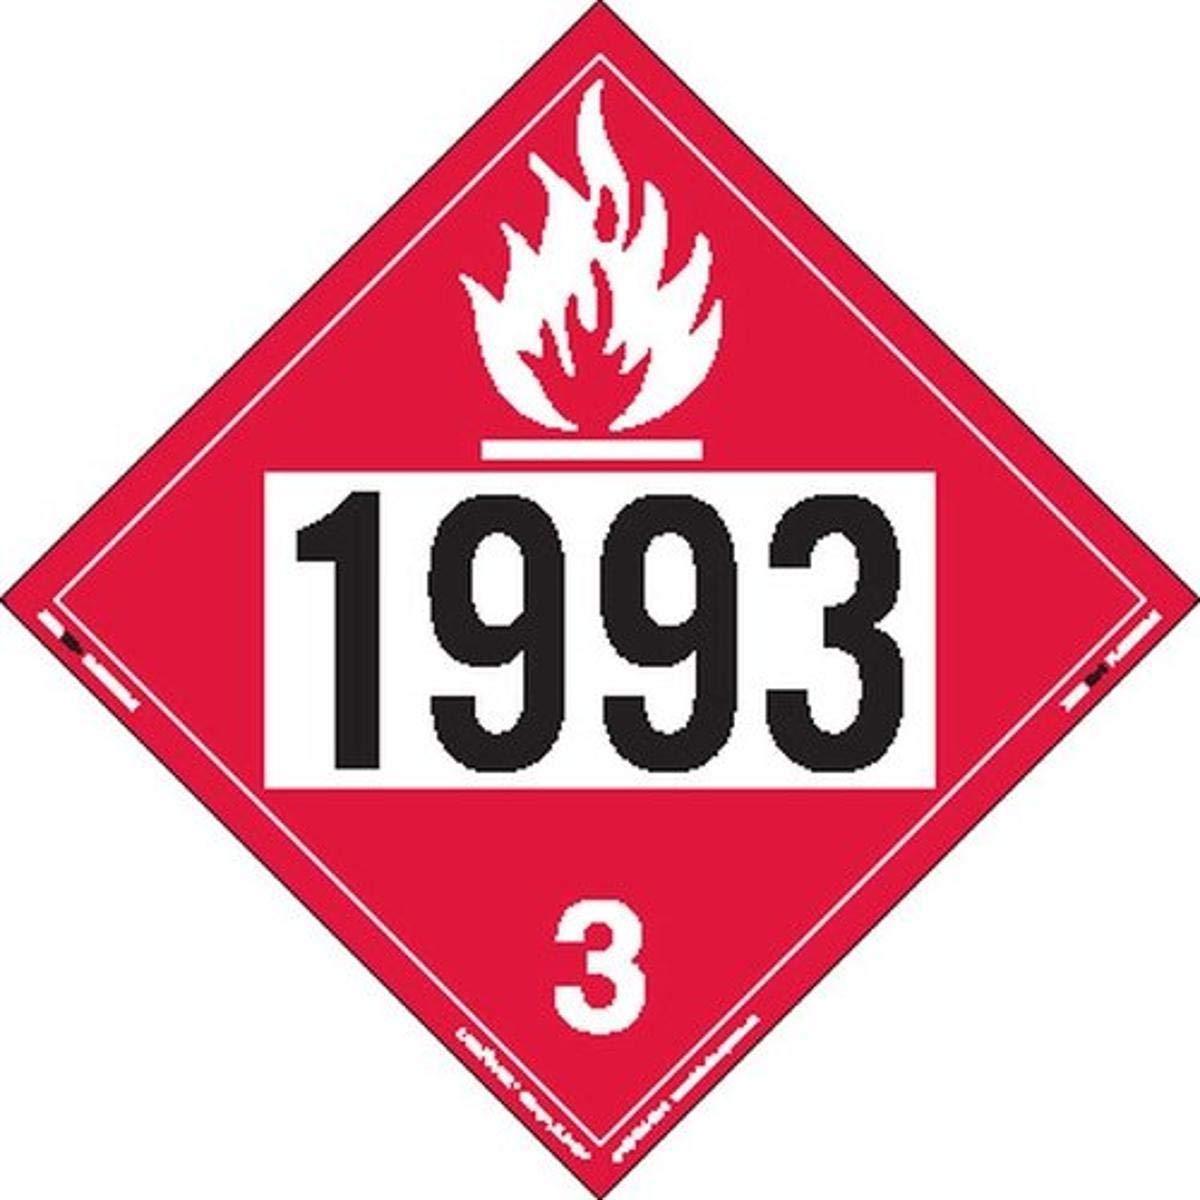 Labelmaster Max 56% OFF ZRV21993 Ranking TOP1 UN 1993 Flammable Ri Liquid Hazmat Placard